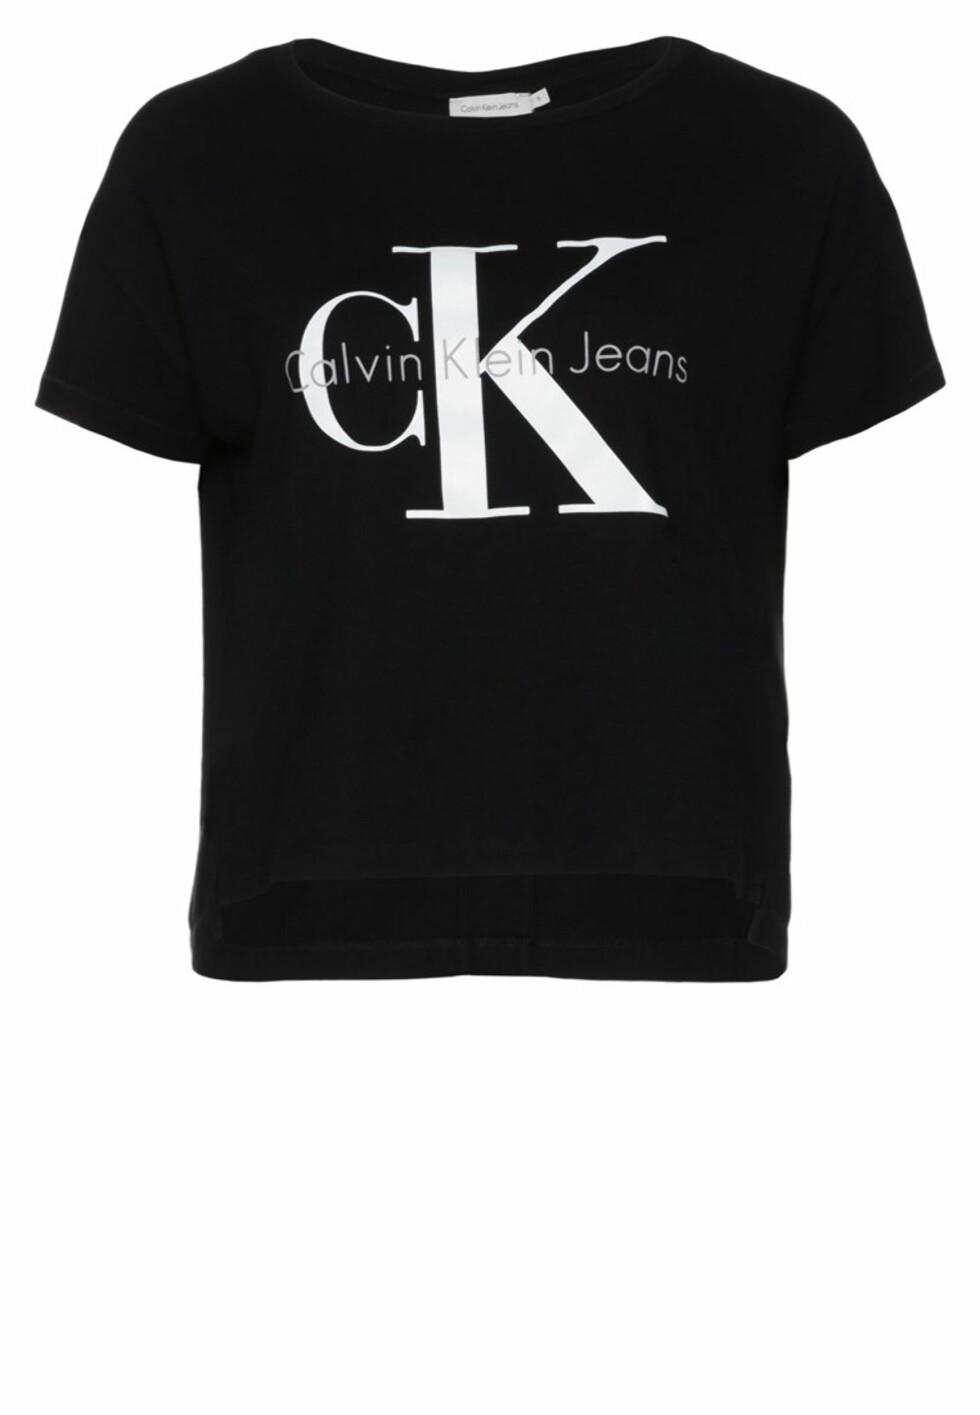 T-skjorte fra Calvin Klein Jeans via Zalando.no, kr 499. Foto: Zalando.no